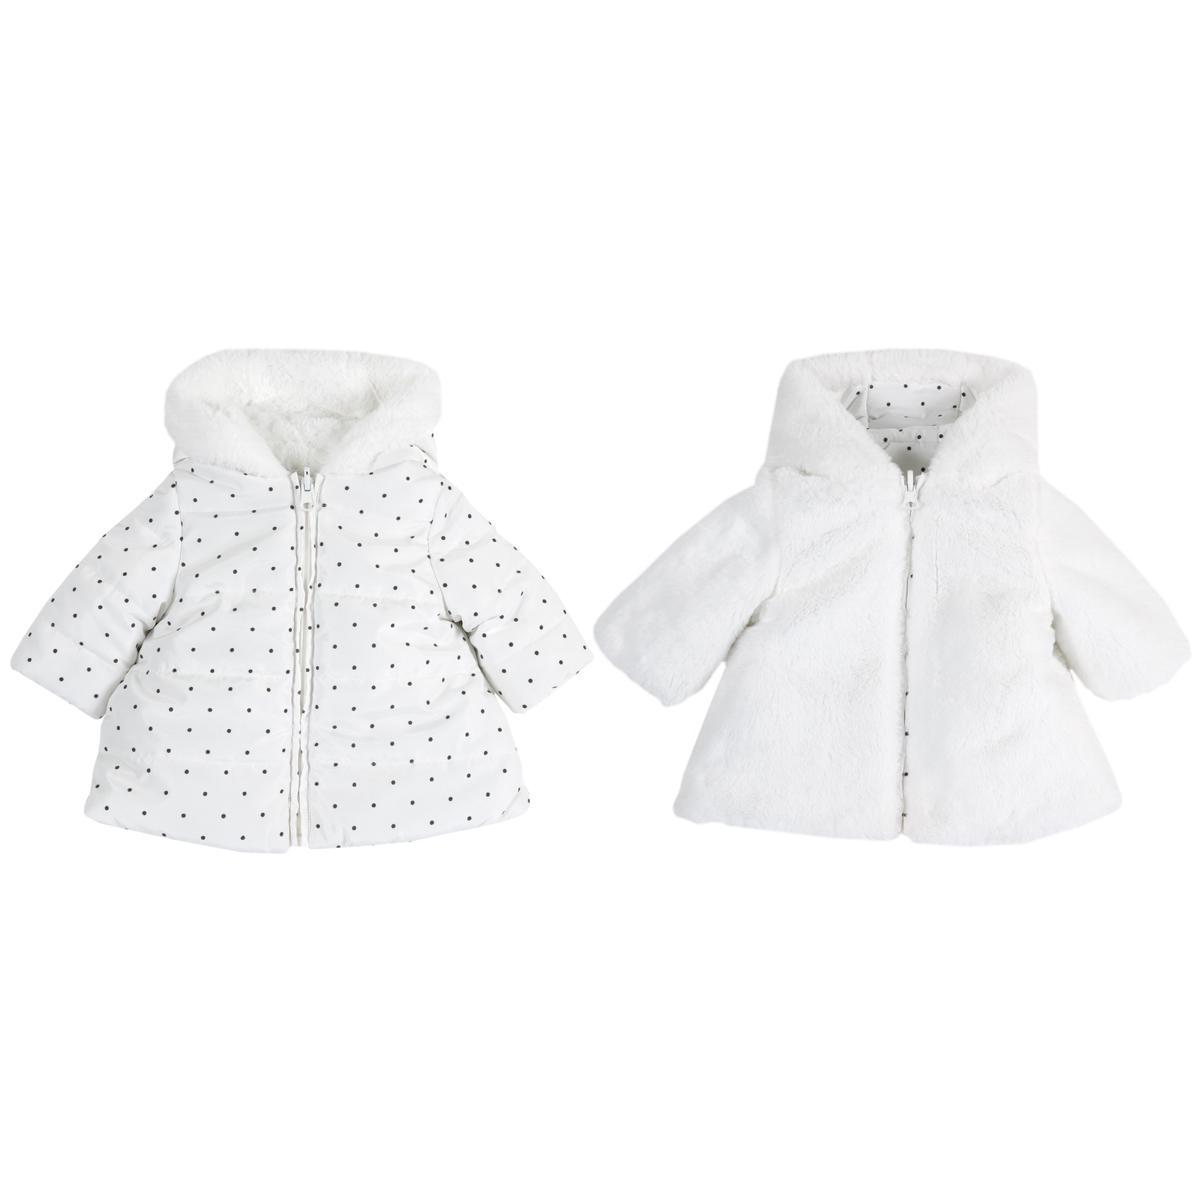 Jacheta copii Chicco, reversibila, blanita artificiala, alb, 87407